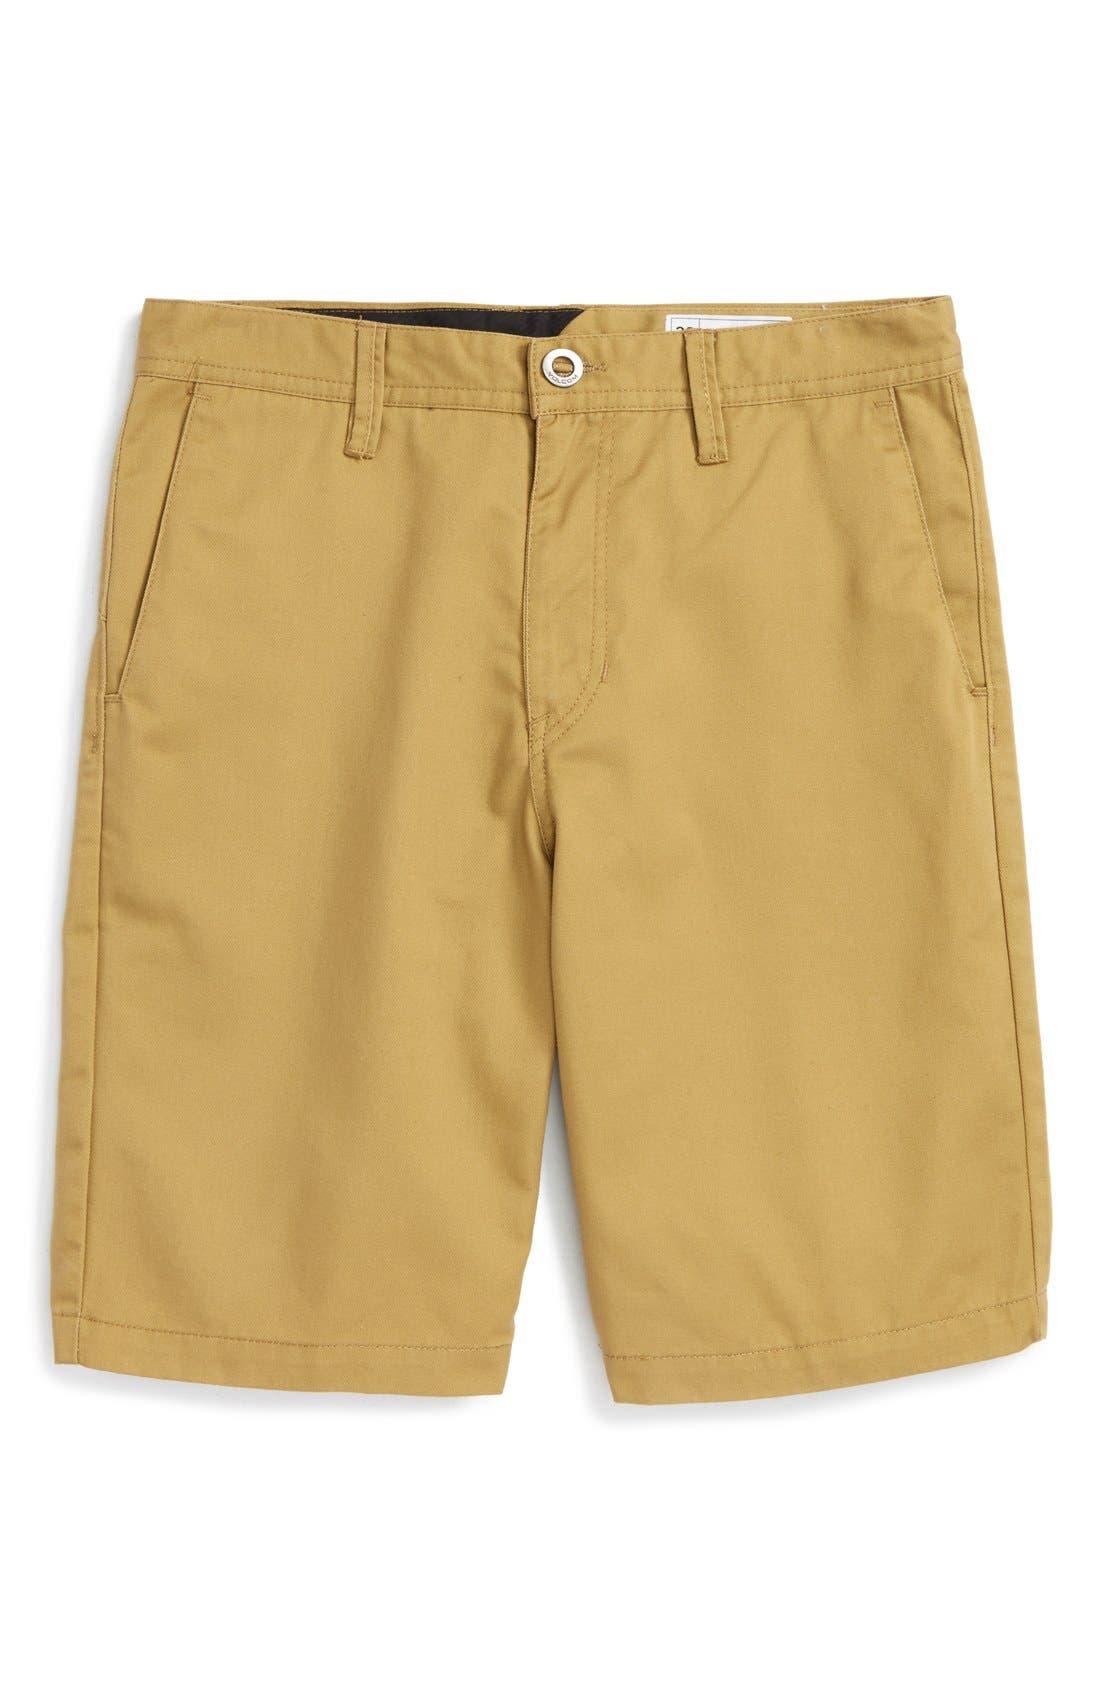 Chino Shorts,                         Main,                         color, KHAKI DARK